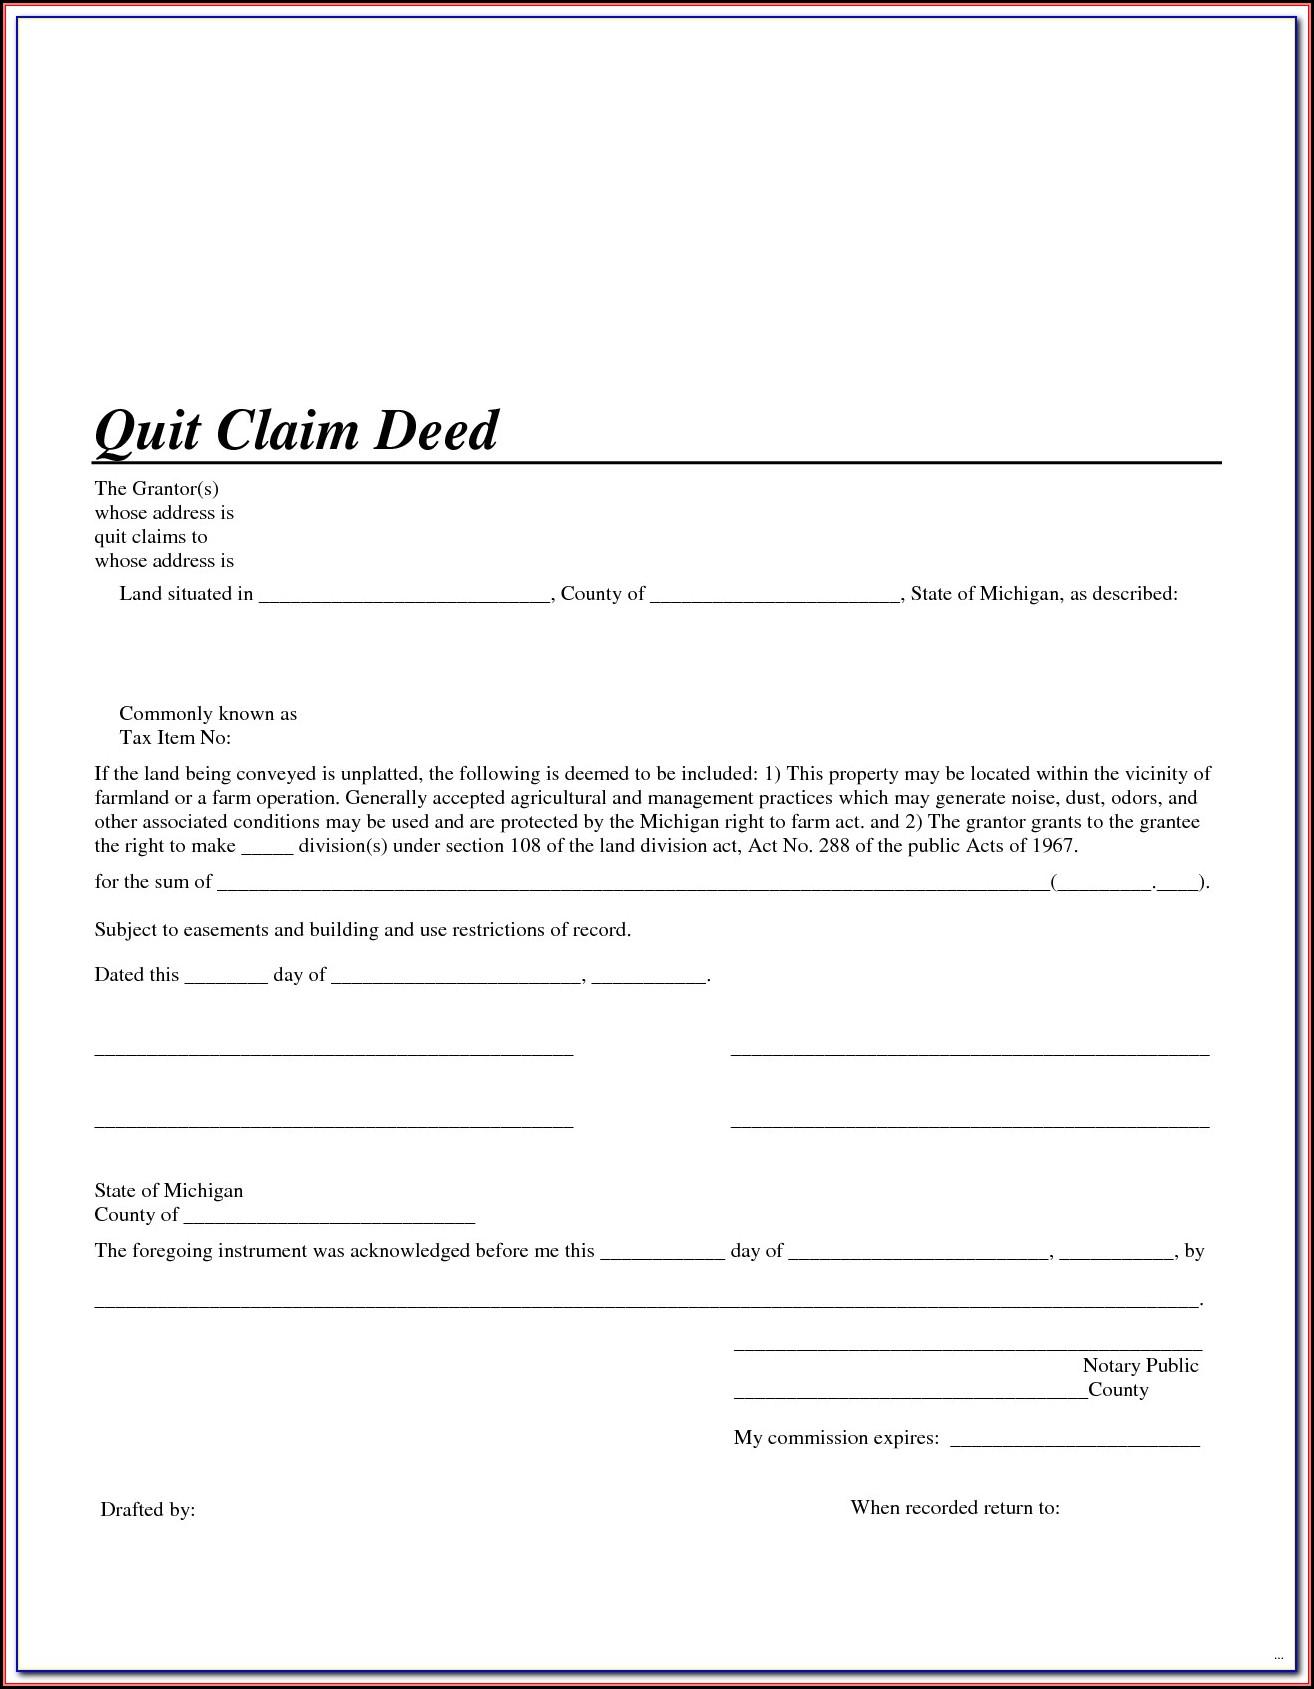 Quit Claim Deed Form Florida Seminole County